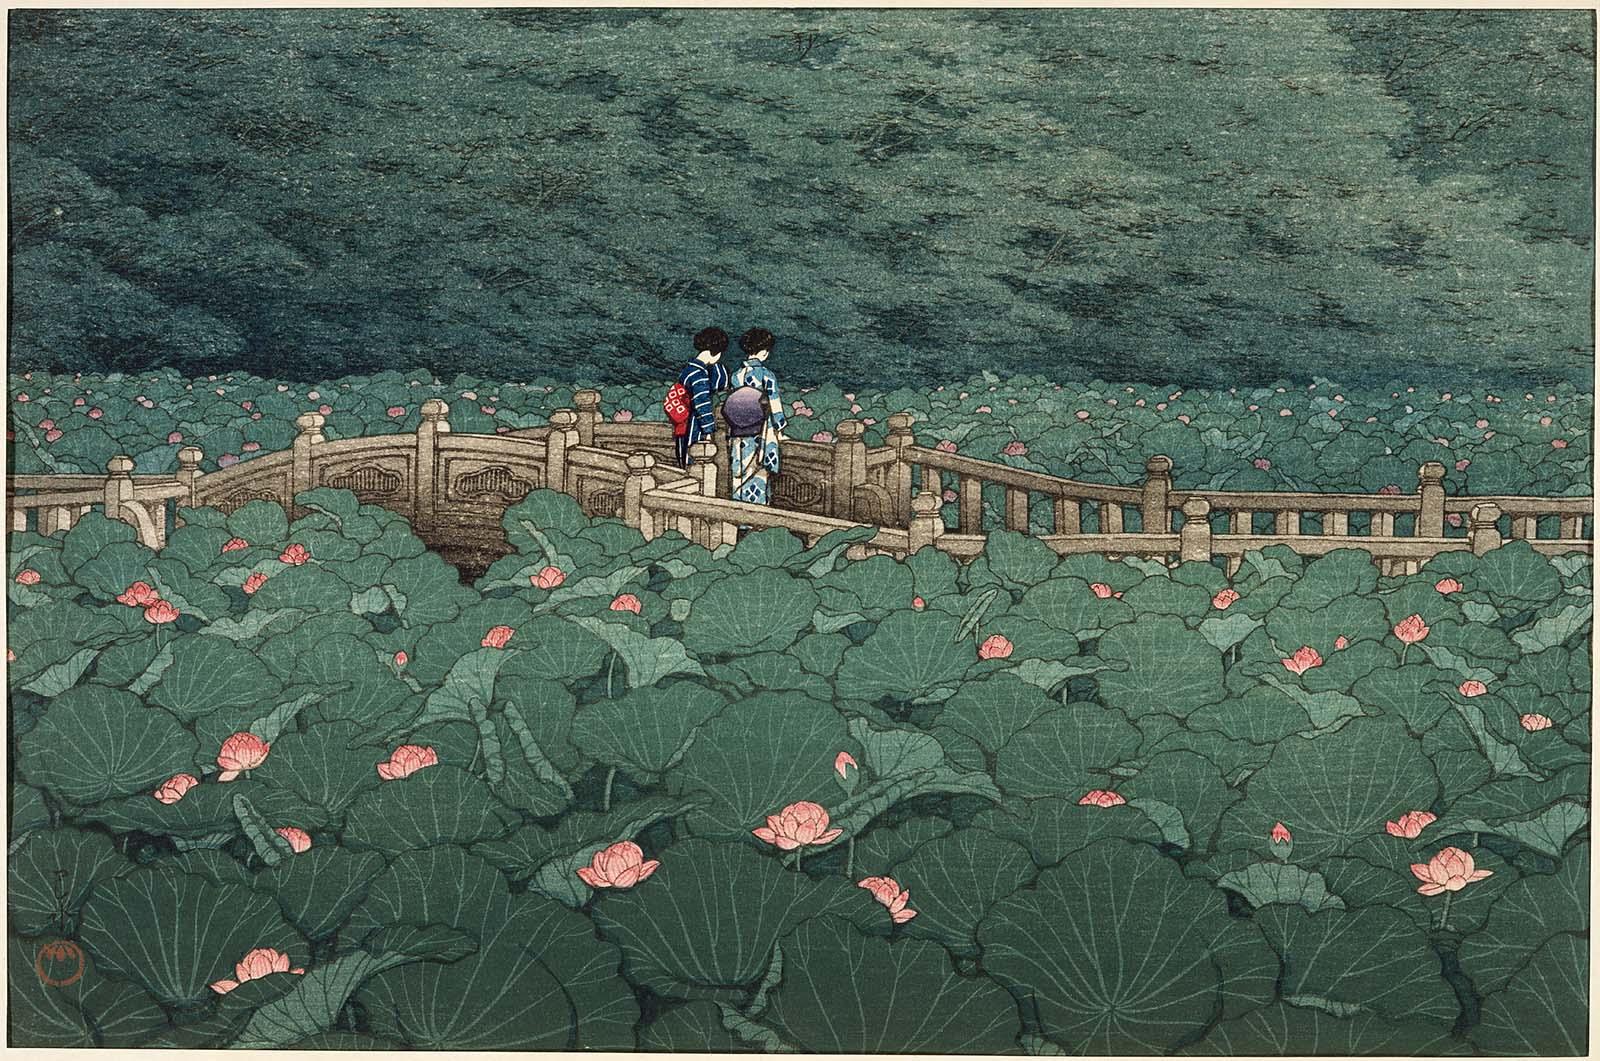 Hasui Kawase - The Pond at Benten Shrine in Shiba (1929)